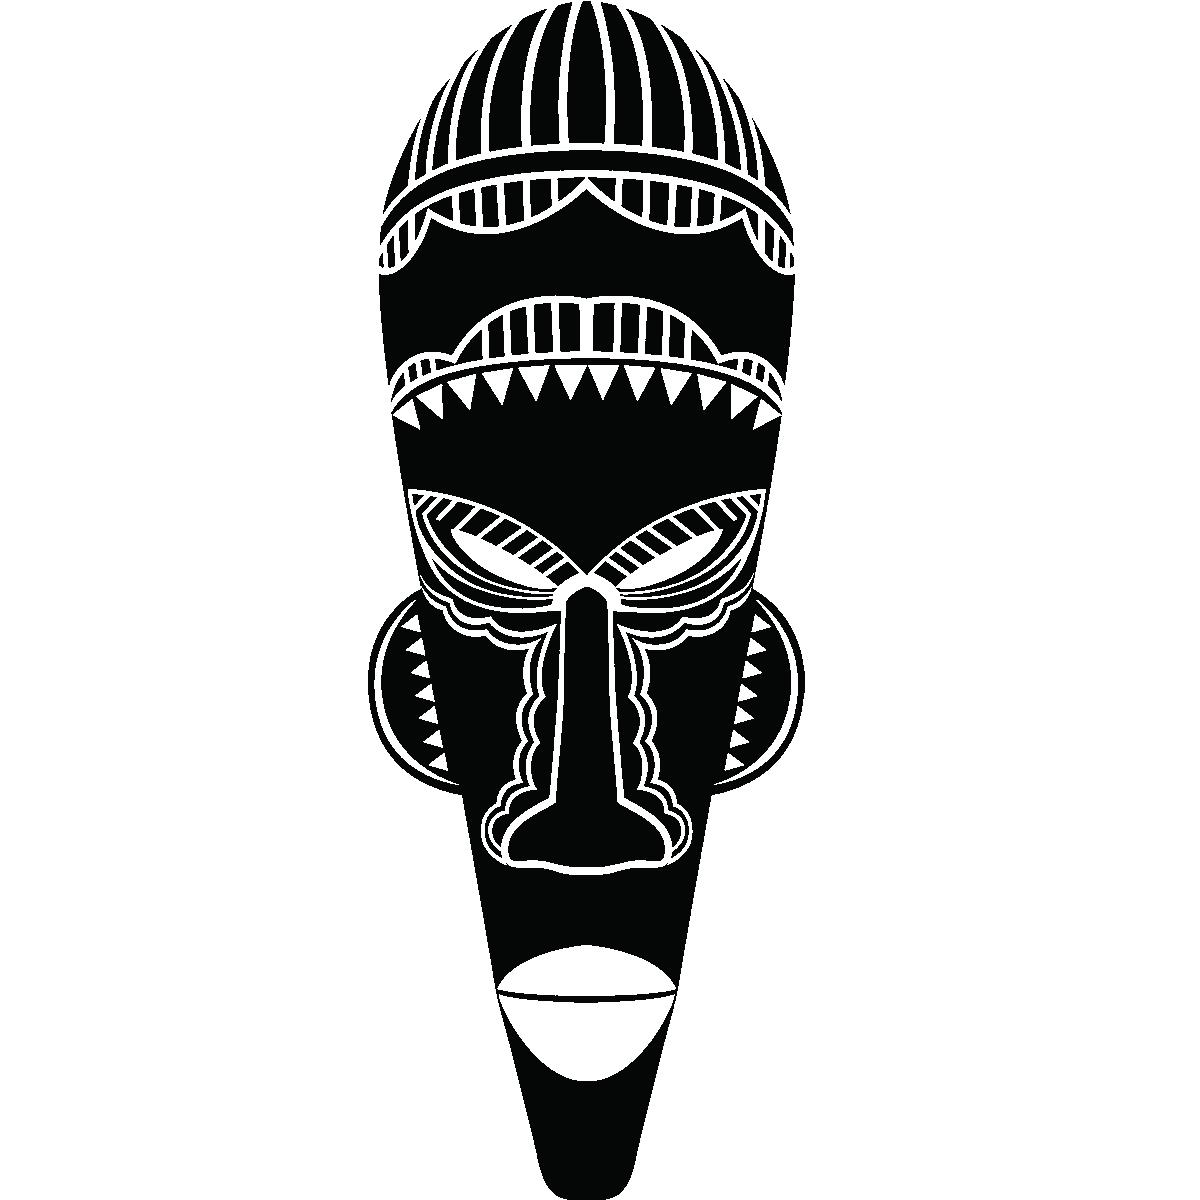 Stickers muraux pays et villes sticker masque africain - Dessin de masque africain ...